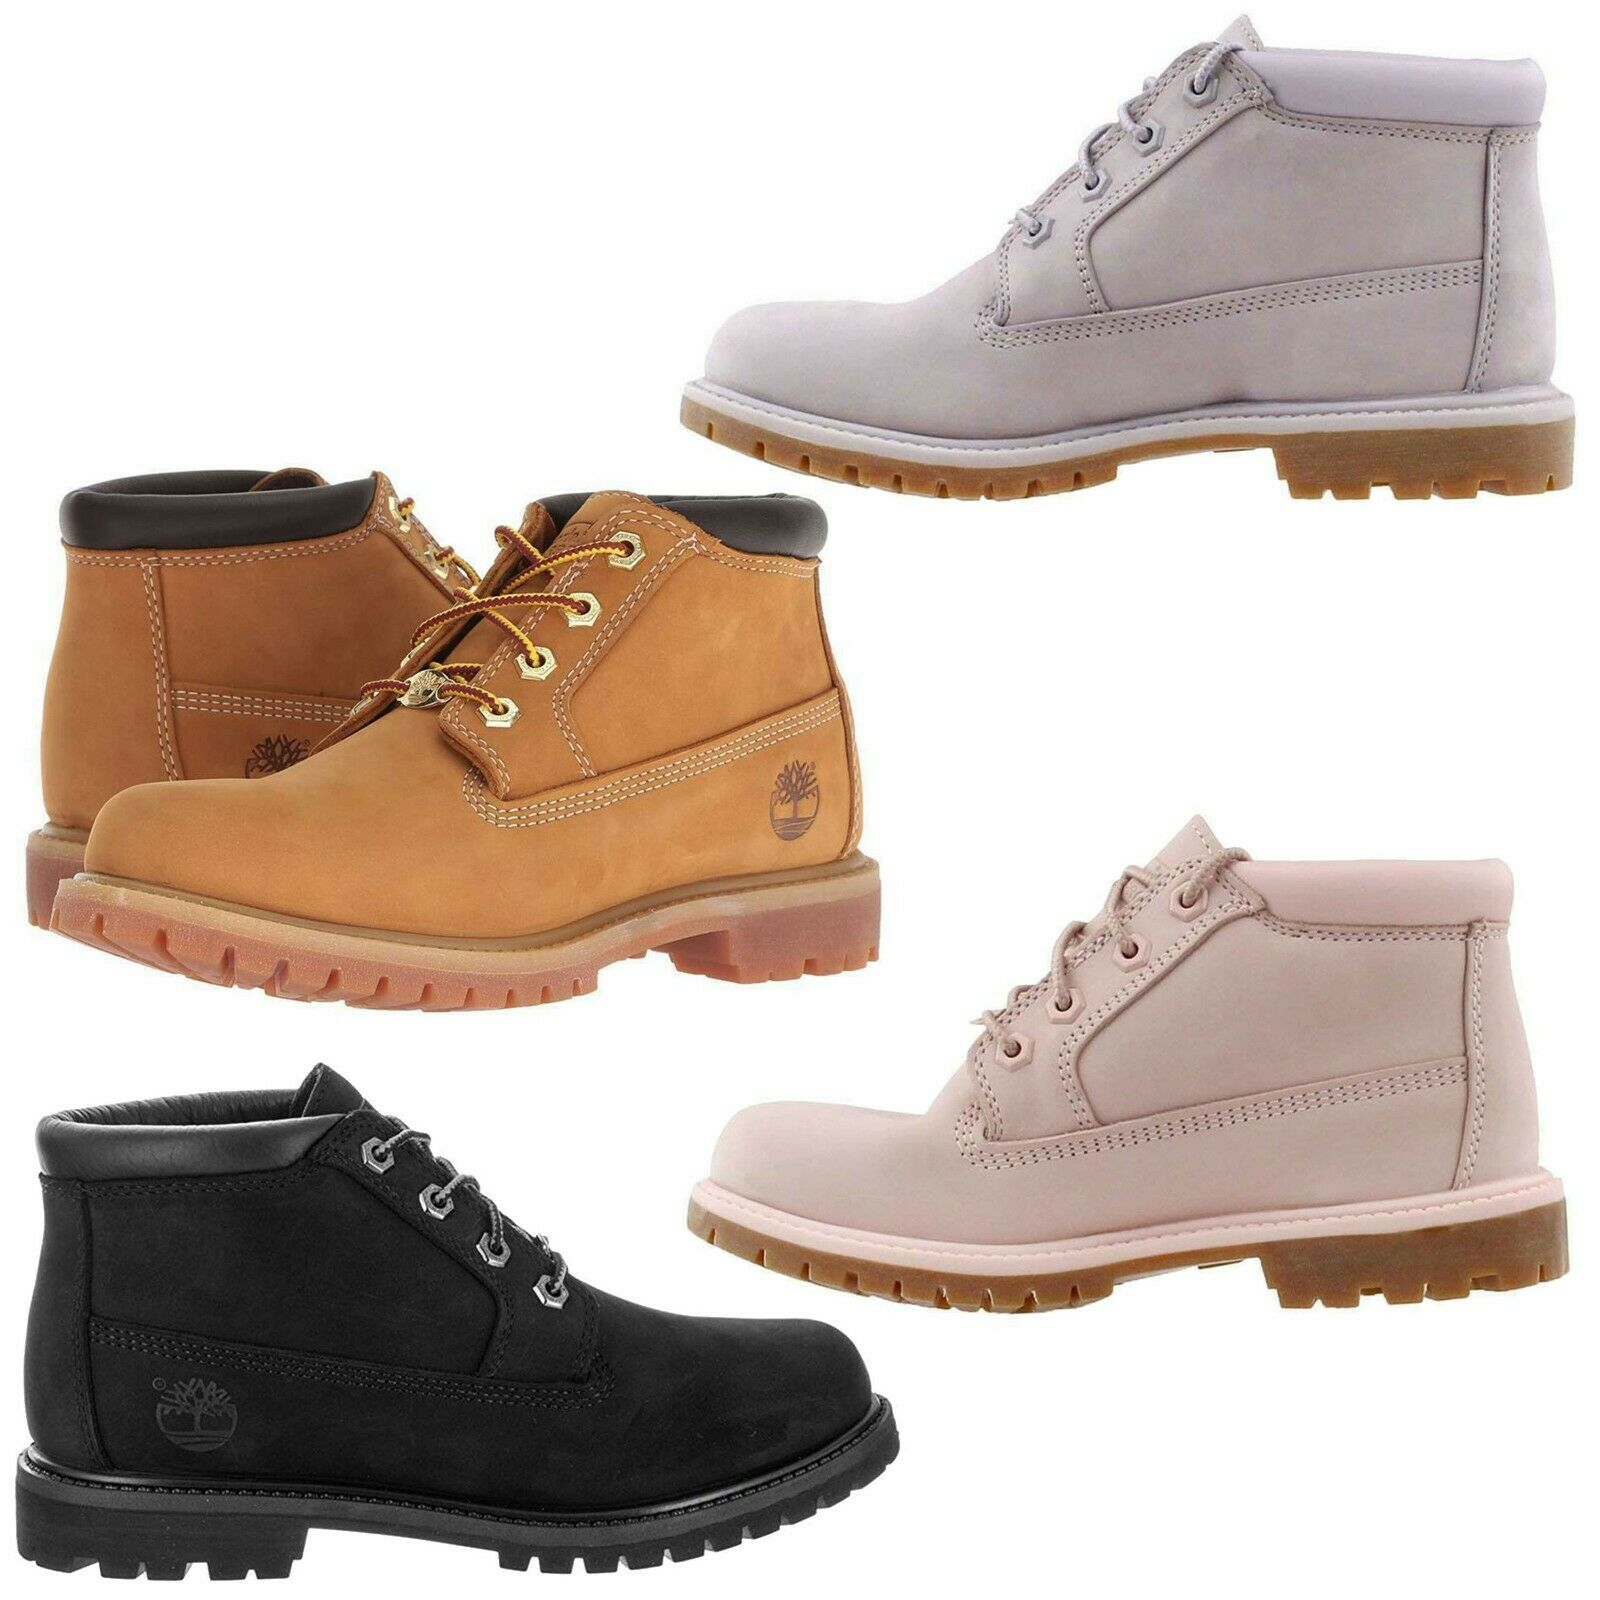 Timberland Women's Nellie Waterproof Rustproof Suede Chukka Boots NEW